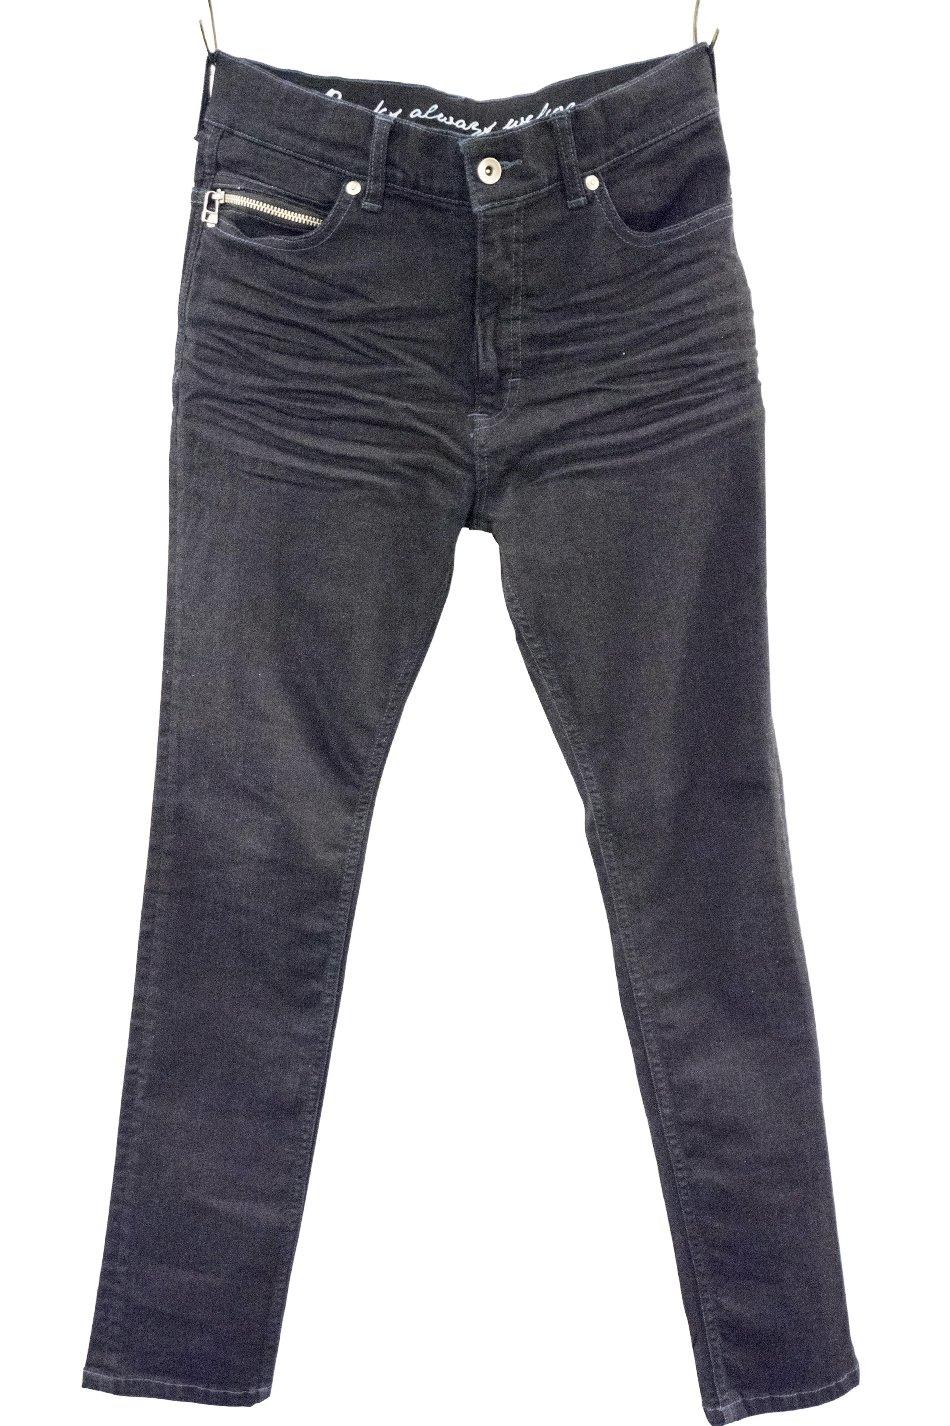 Super ST Denim Pants Vicious/Indigo